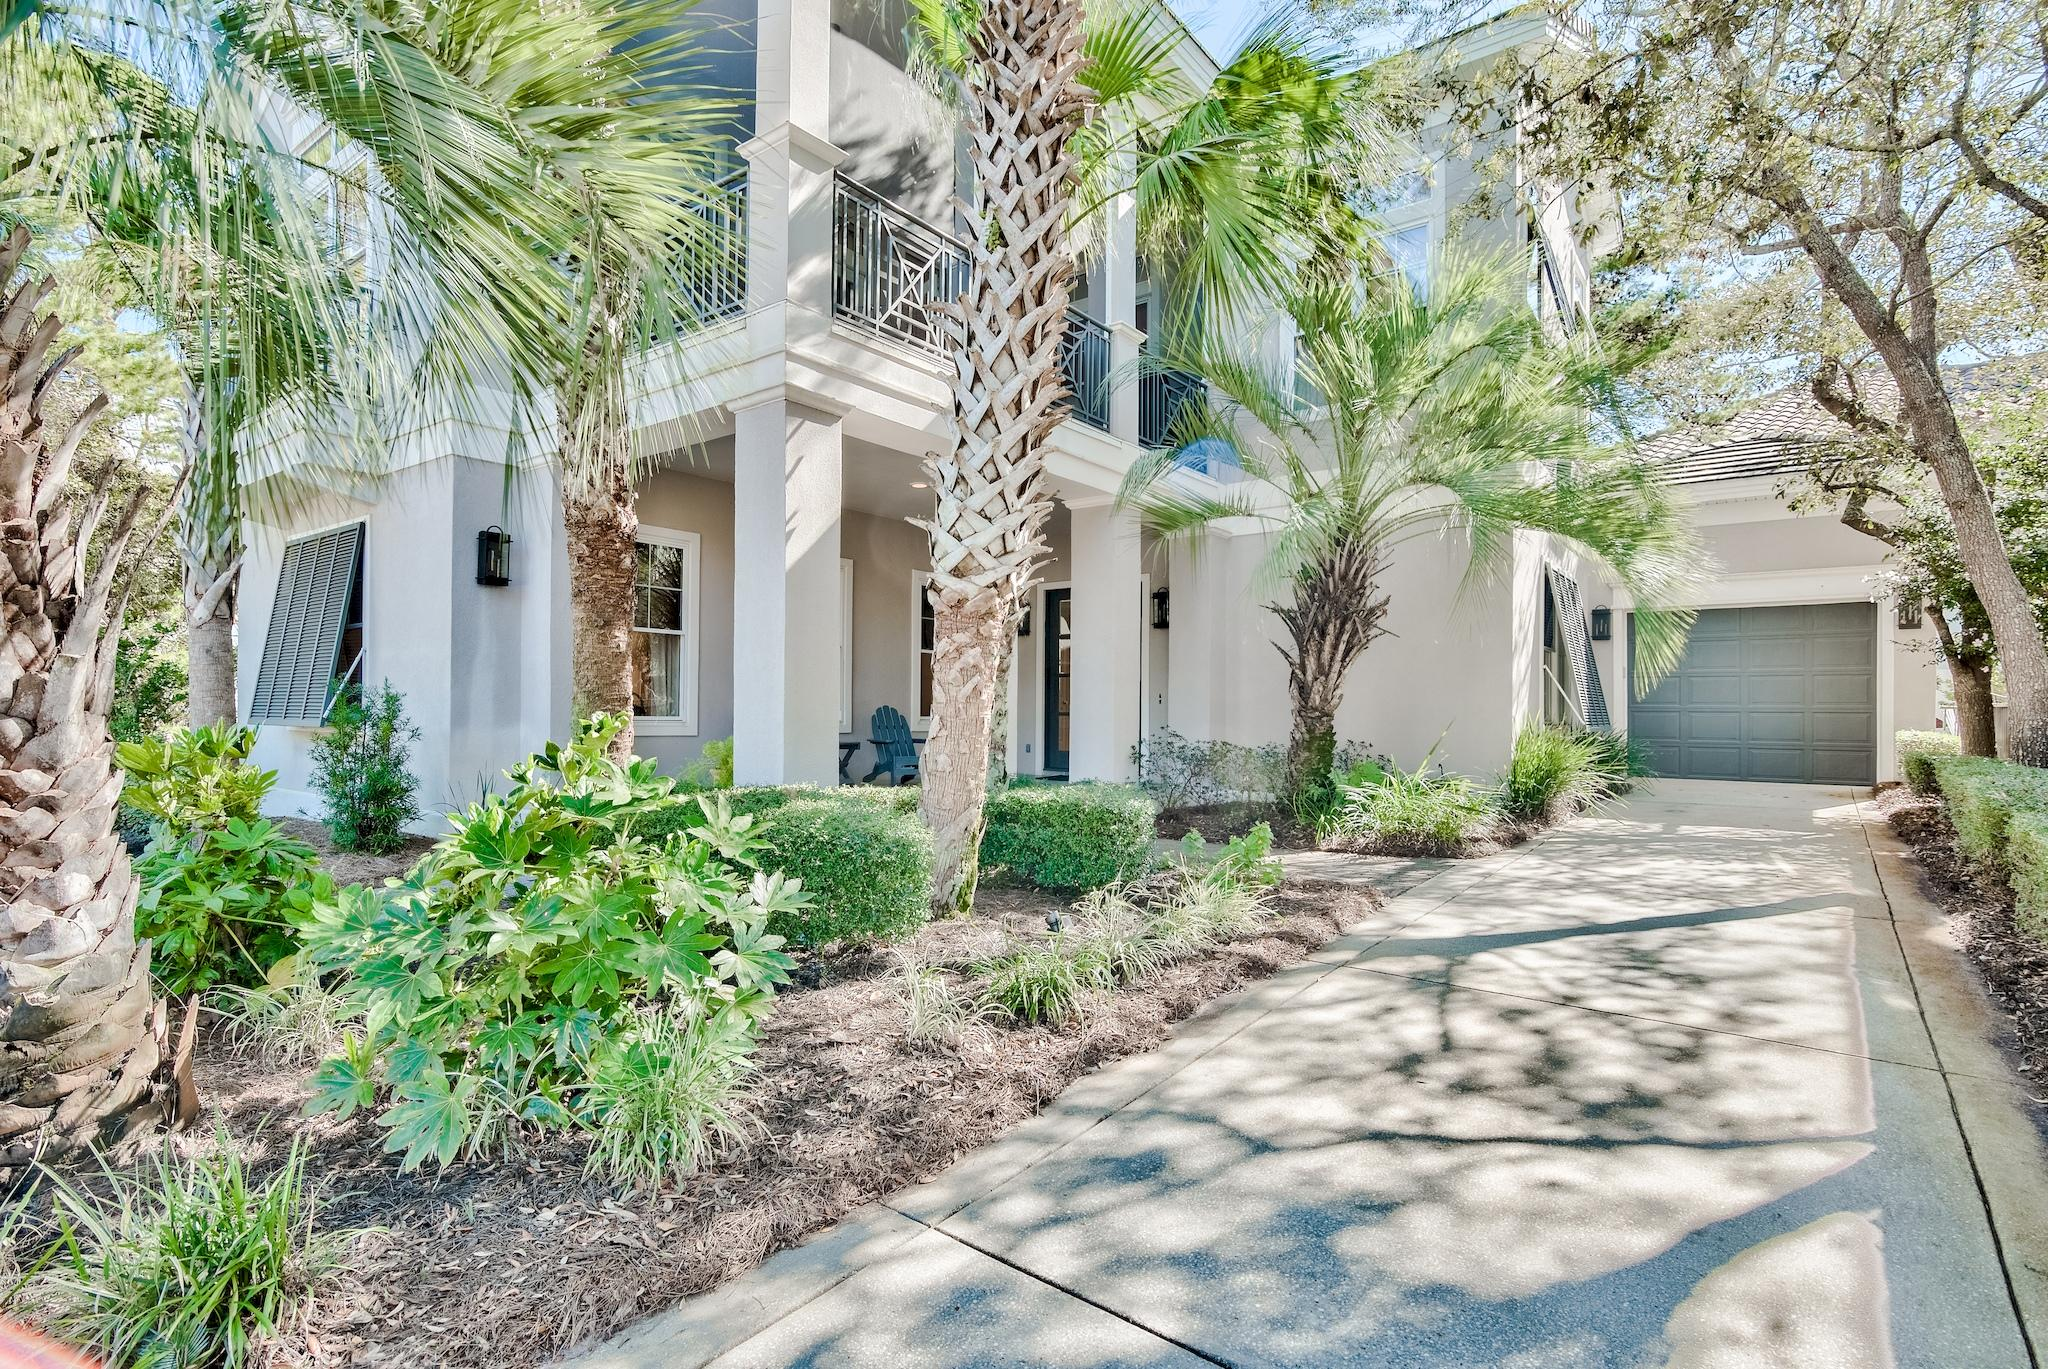 Photo of home for sale at 53 White Cliffs, Santa Rosa Beach FL